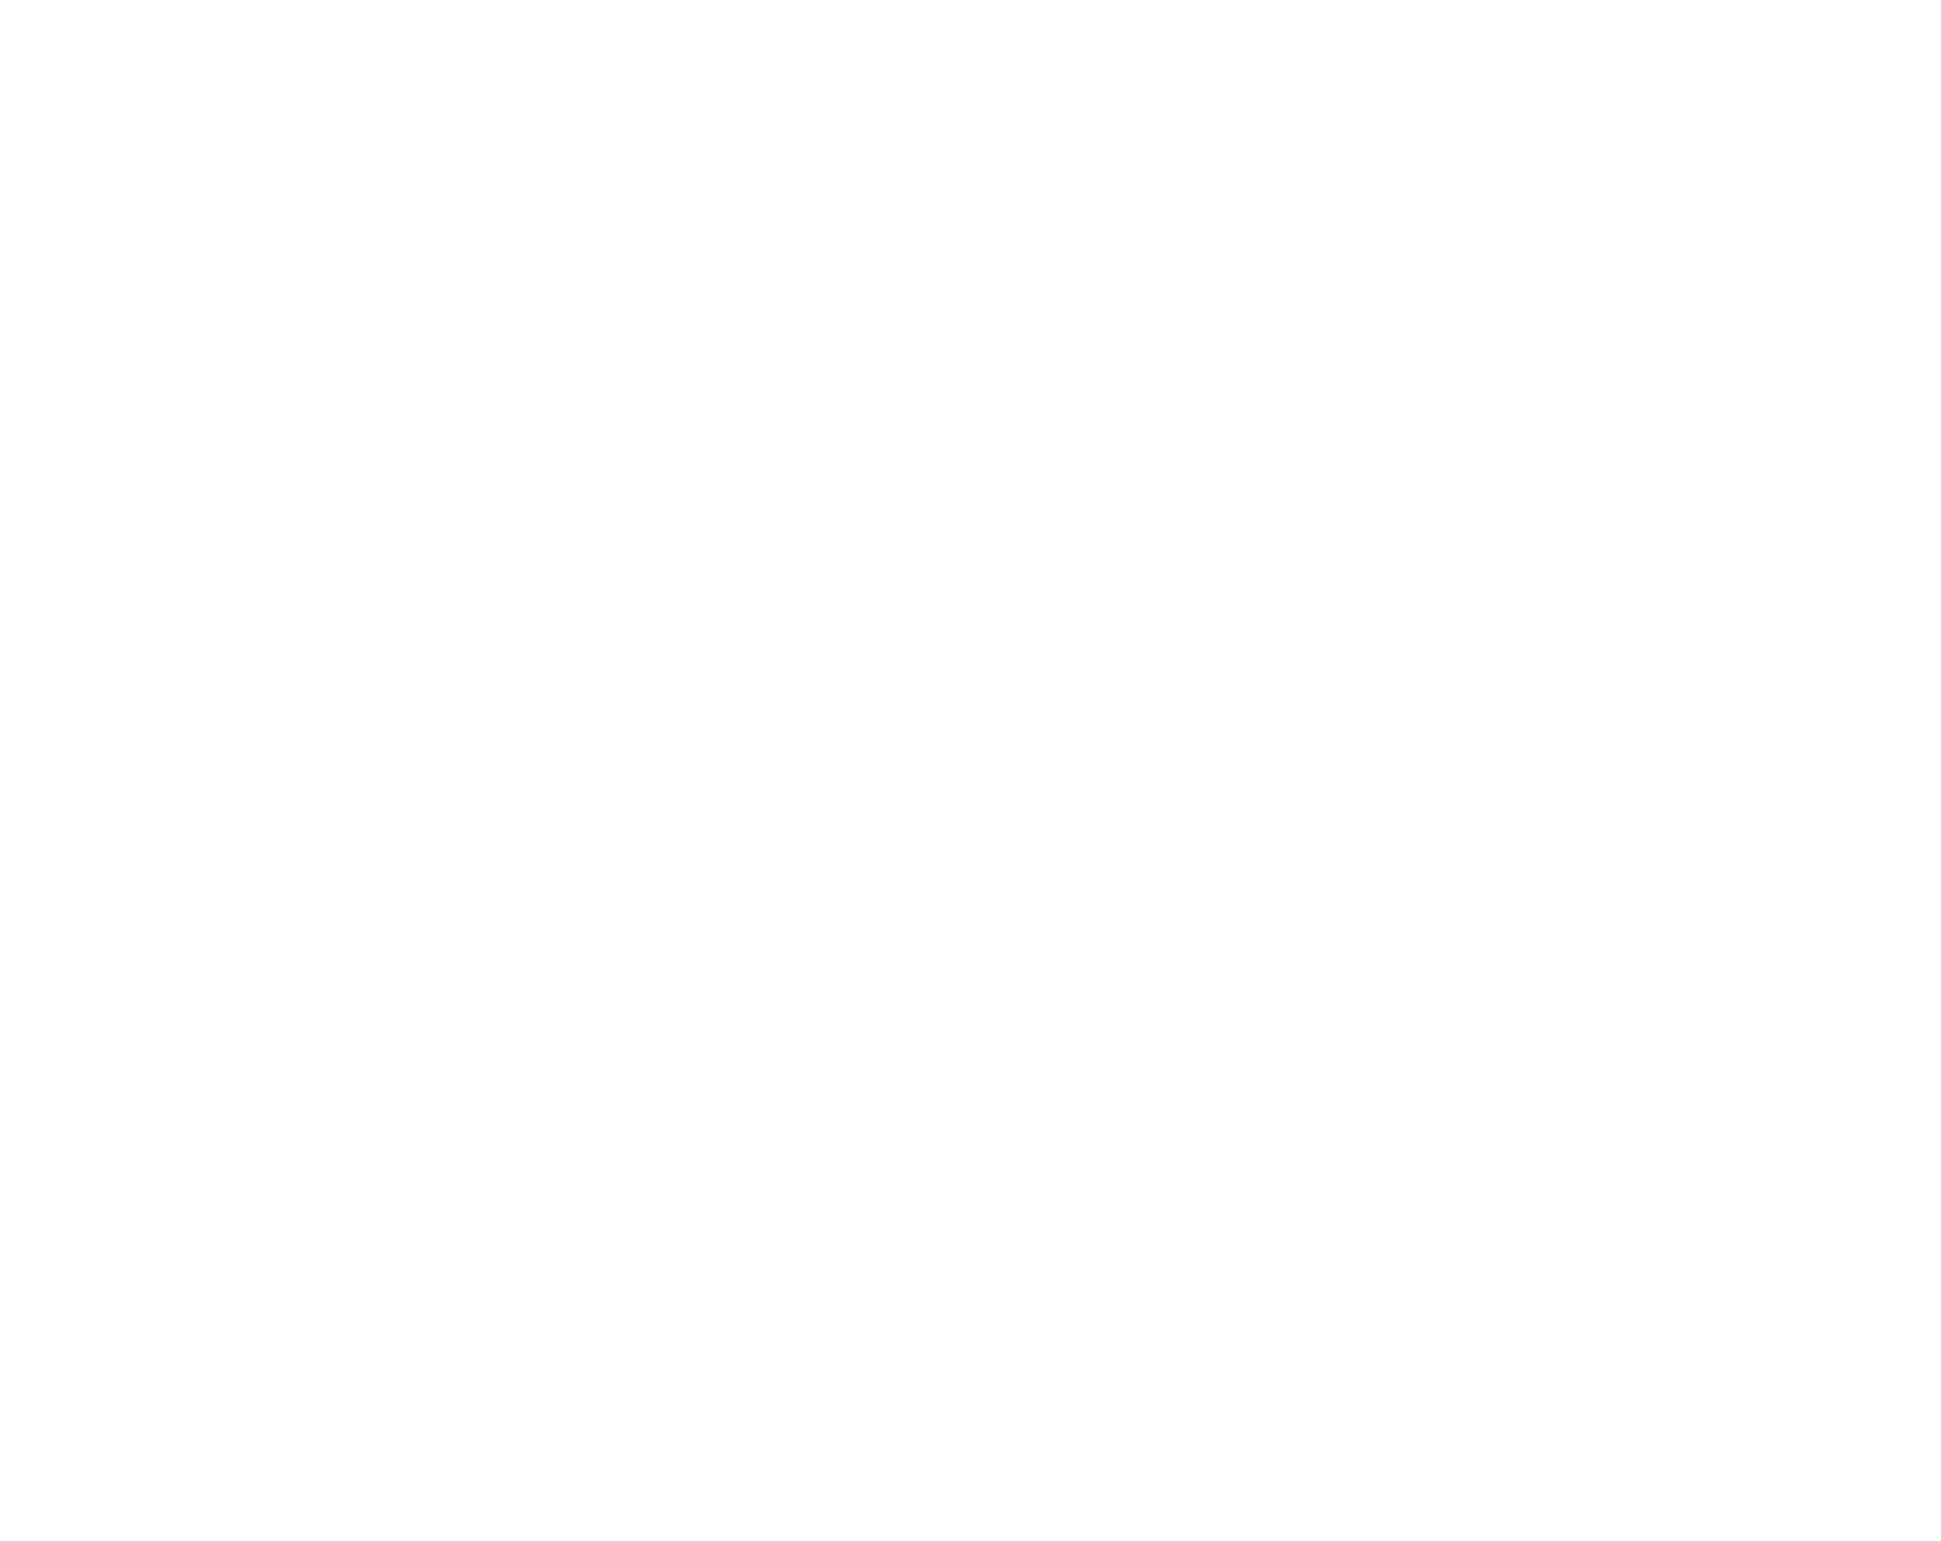 charity2 - EJN2018